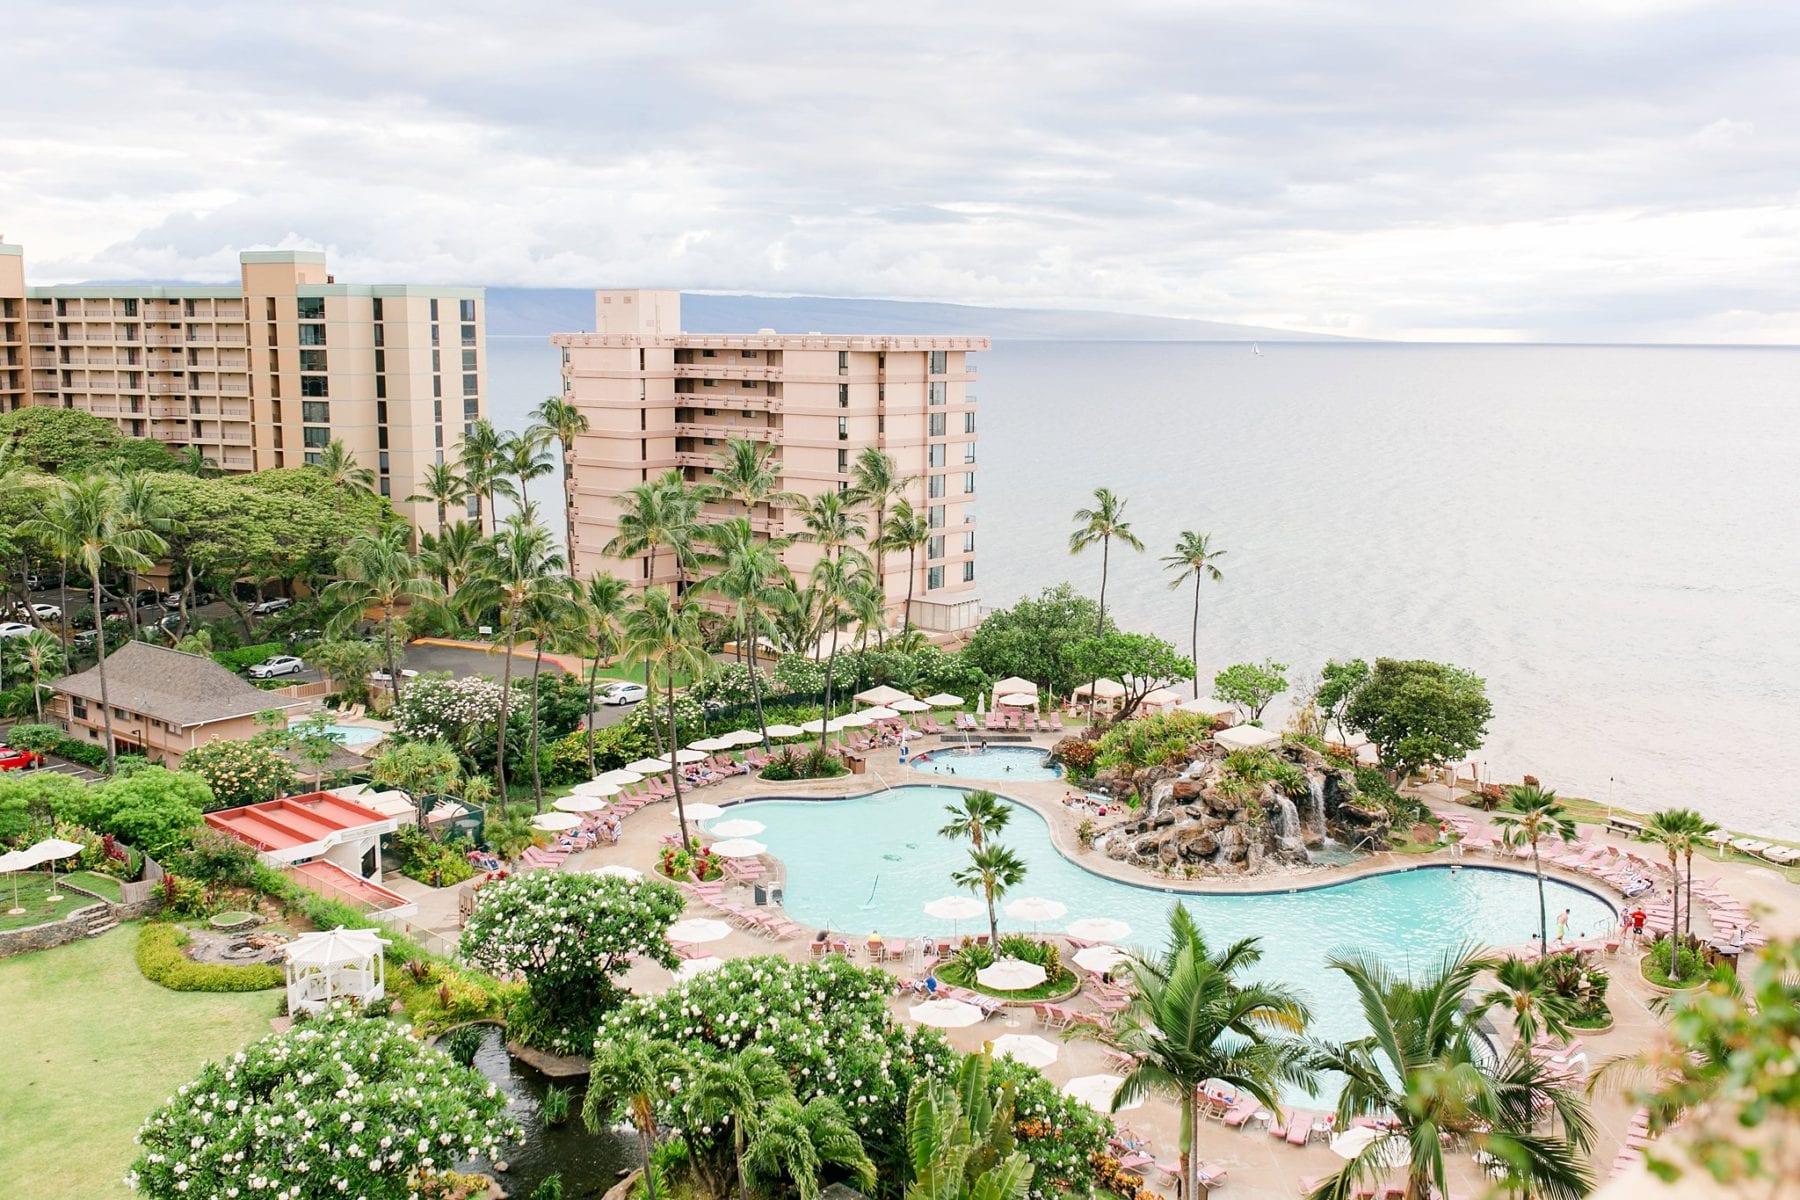 Hawaii Honeymoon Photos Megan & Justin Maui Vacation Things To Do-31.jpg